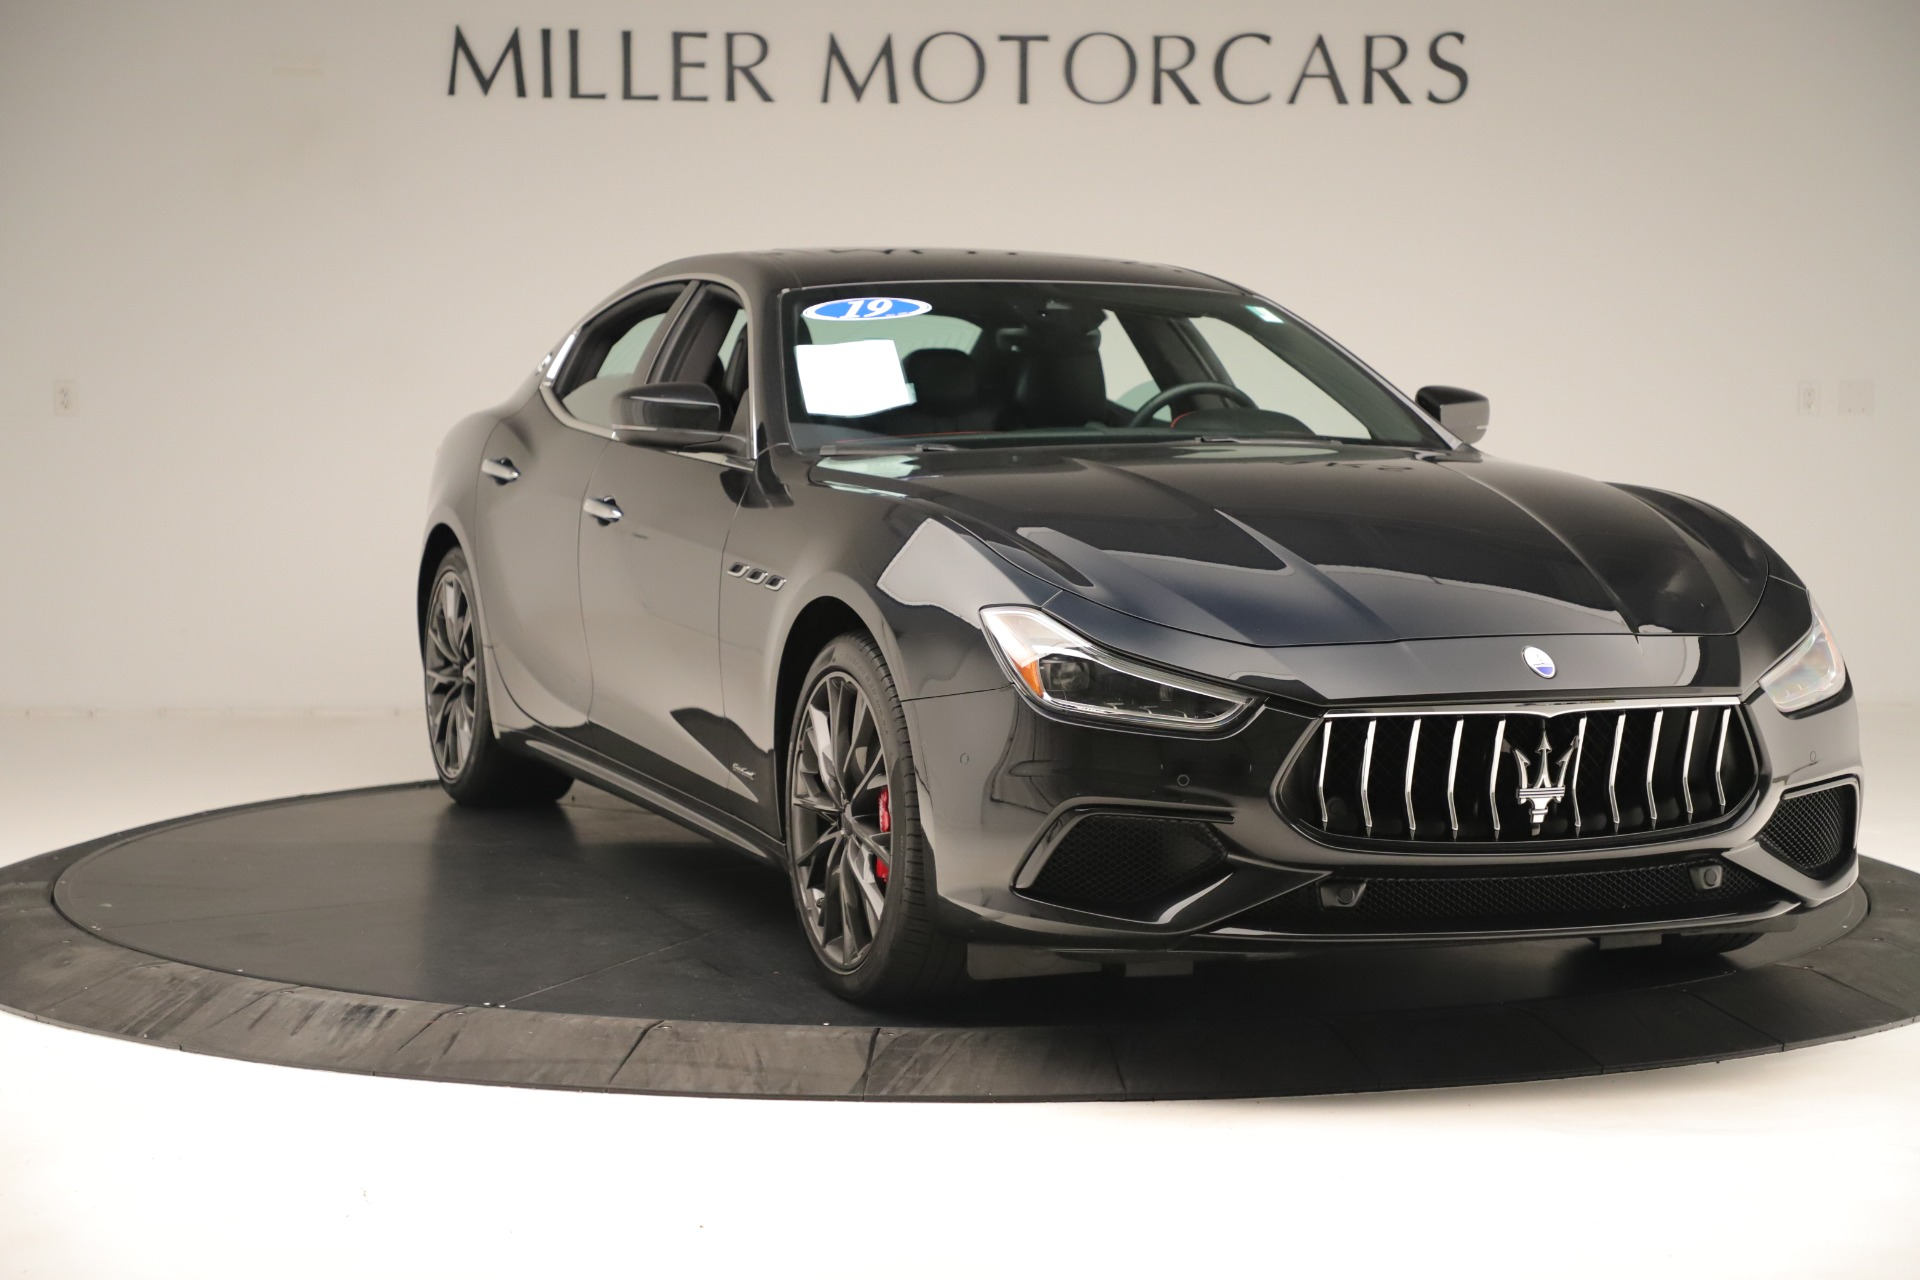 New 2019 Maserati Ghibli S Q4 GranSport For Sale In Greenwich, CT 2640_p11